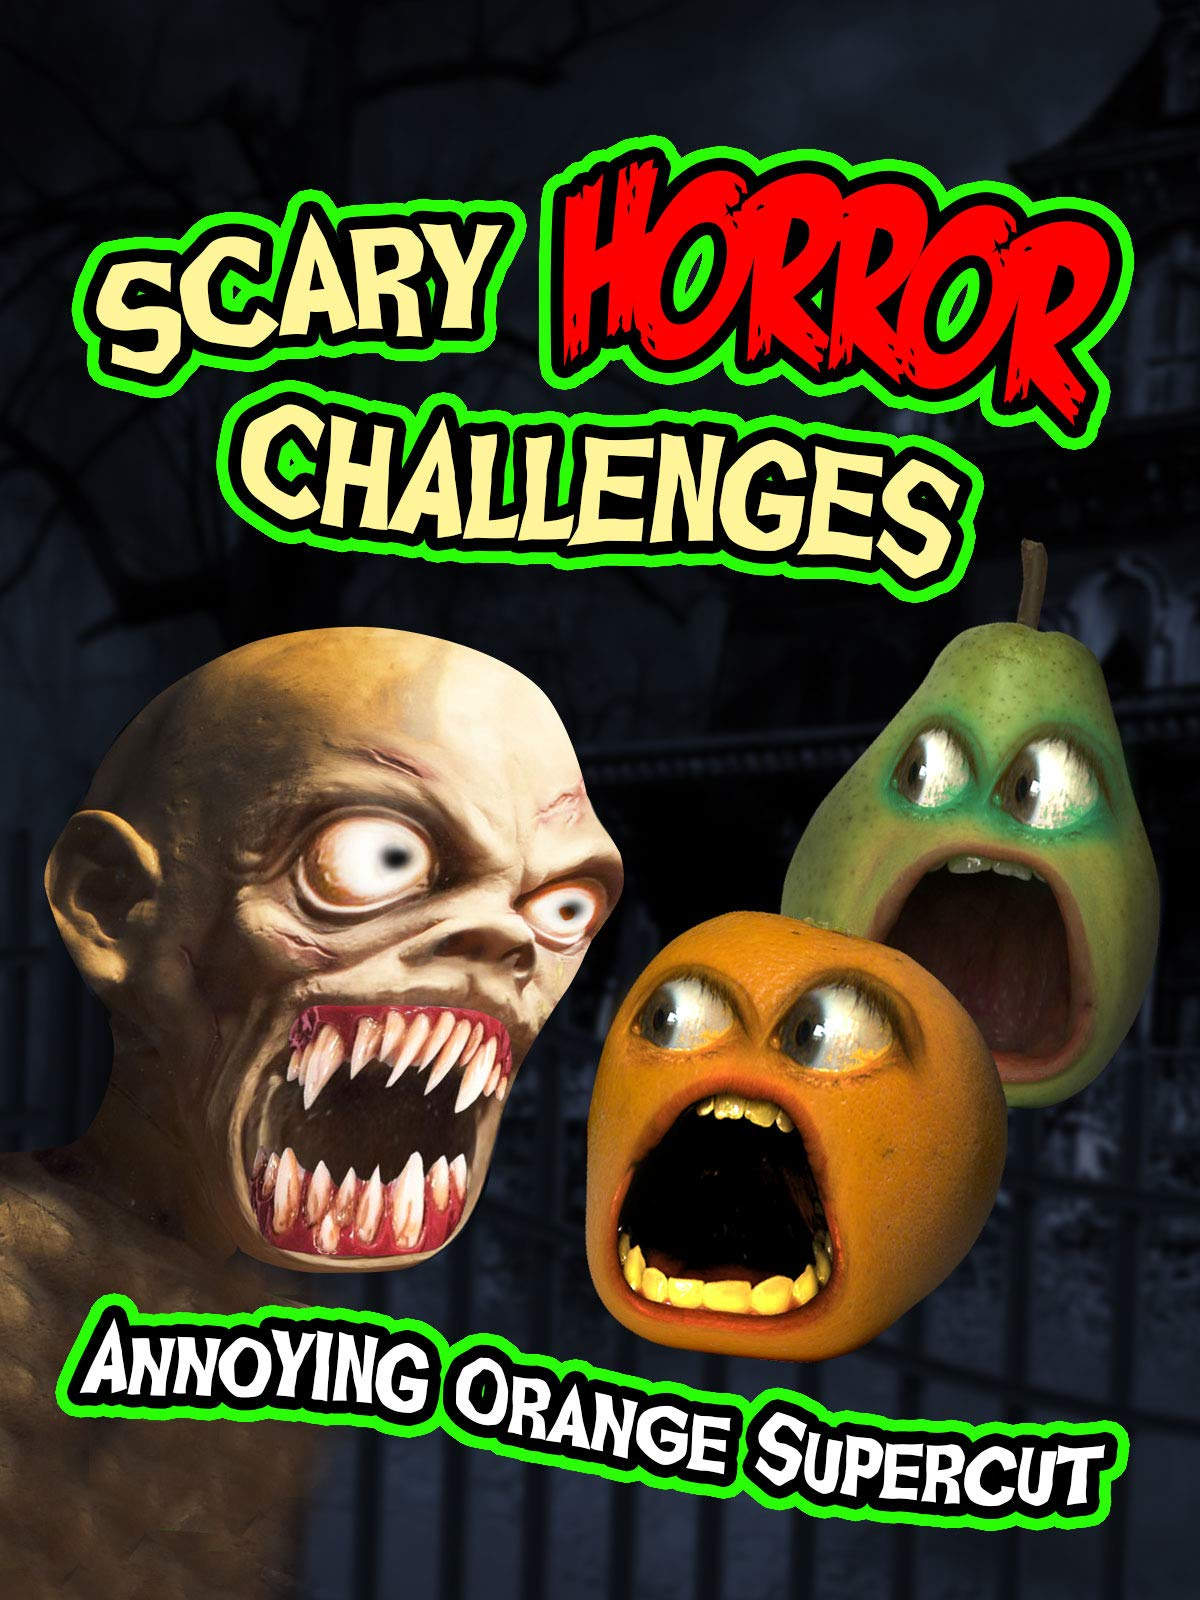 Scary Horror Challenges (Annoying Orange Supercut)